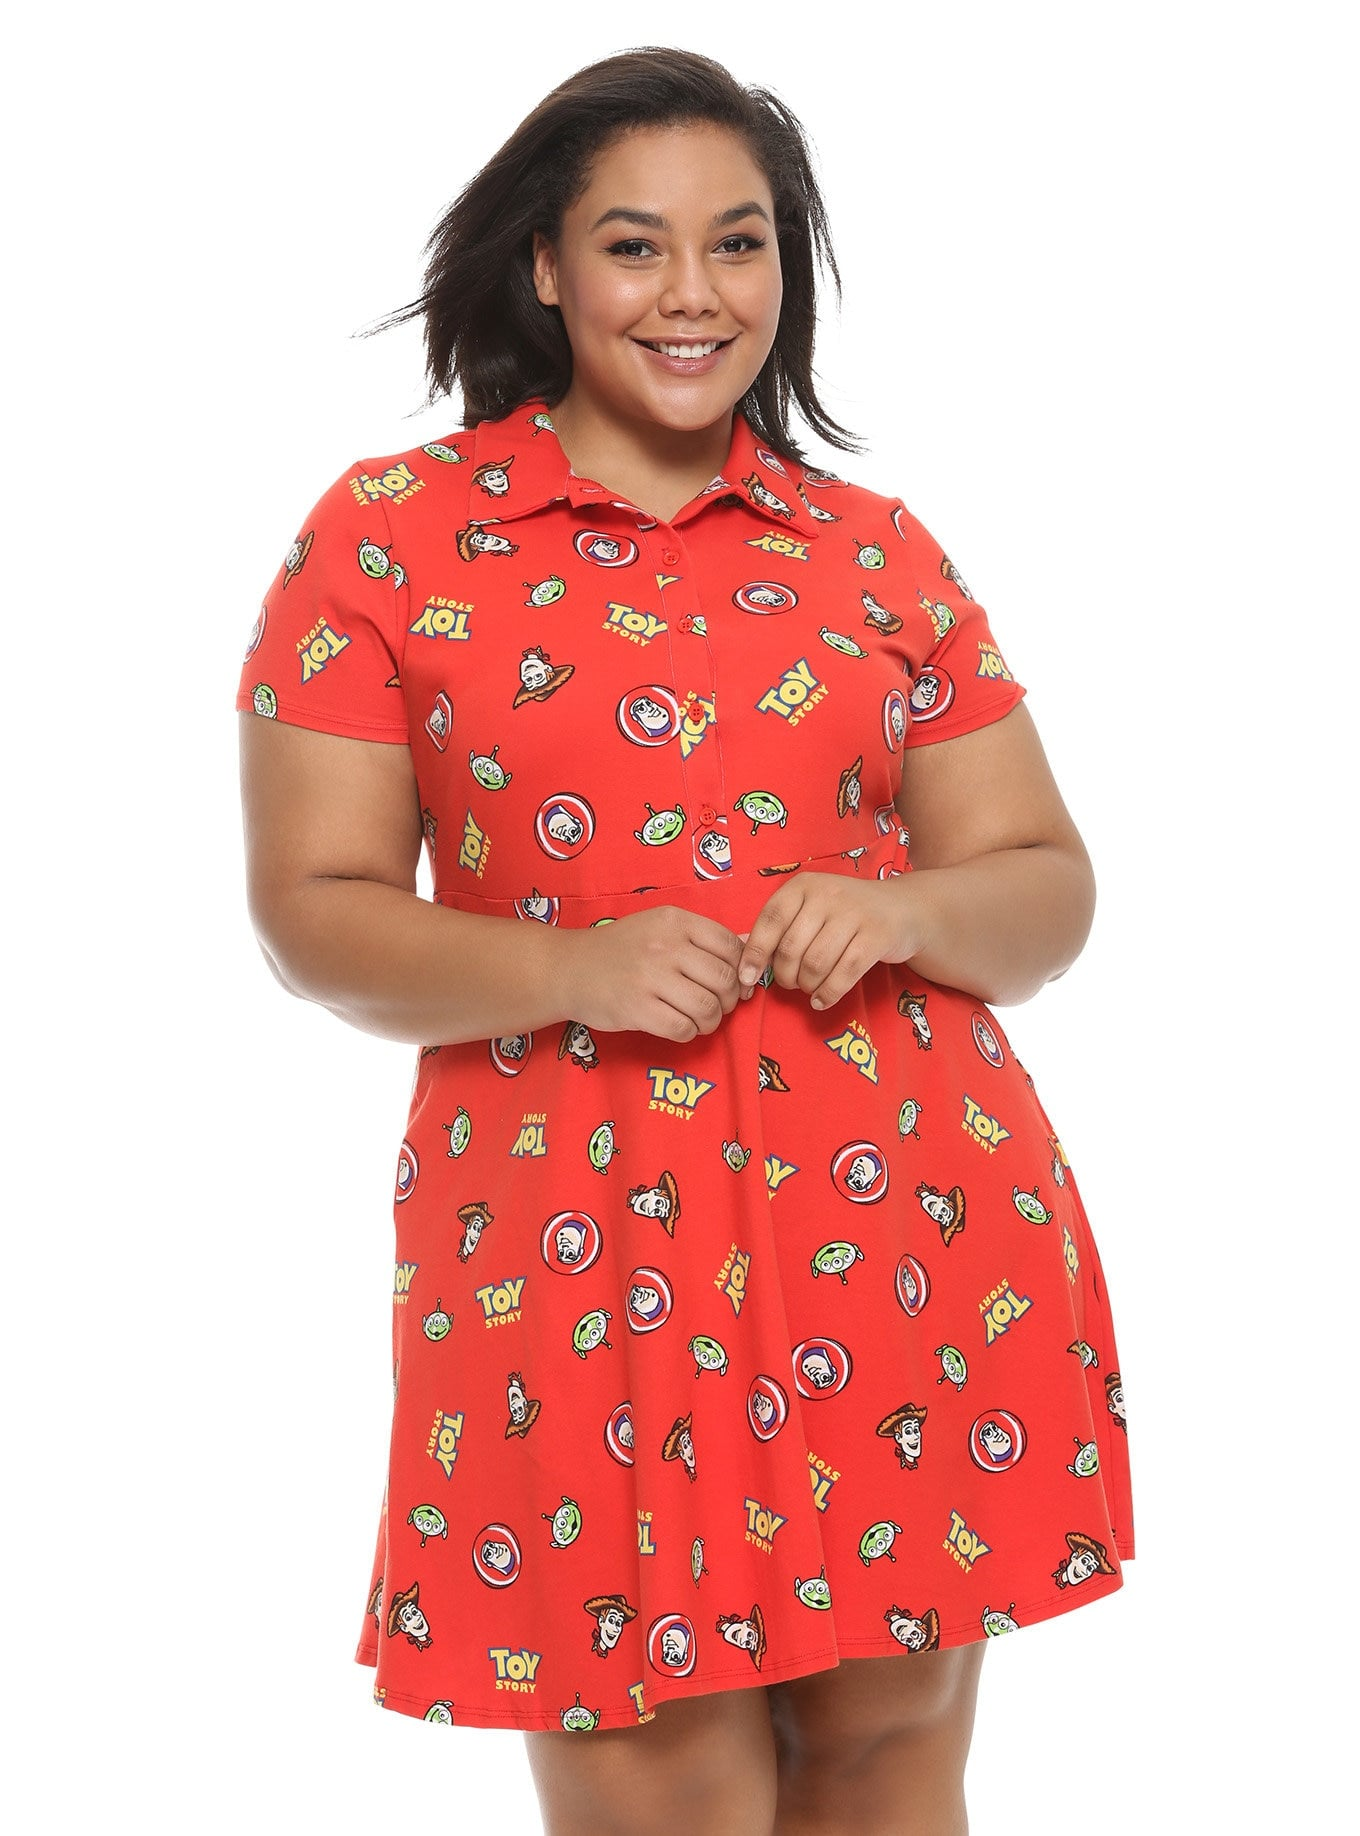 Disney Pixar Toy Story Red Collared Dress Plus Size   Take ...